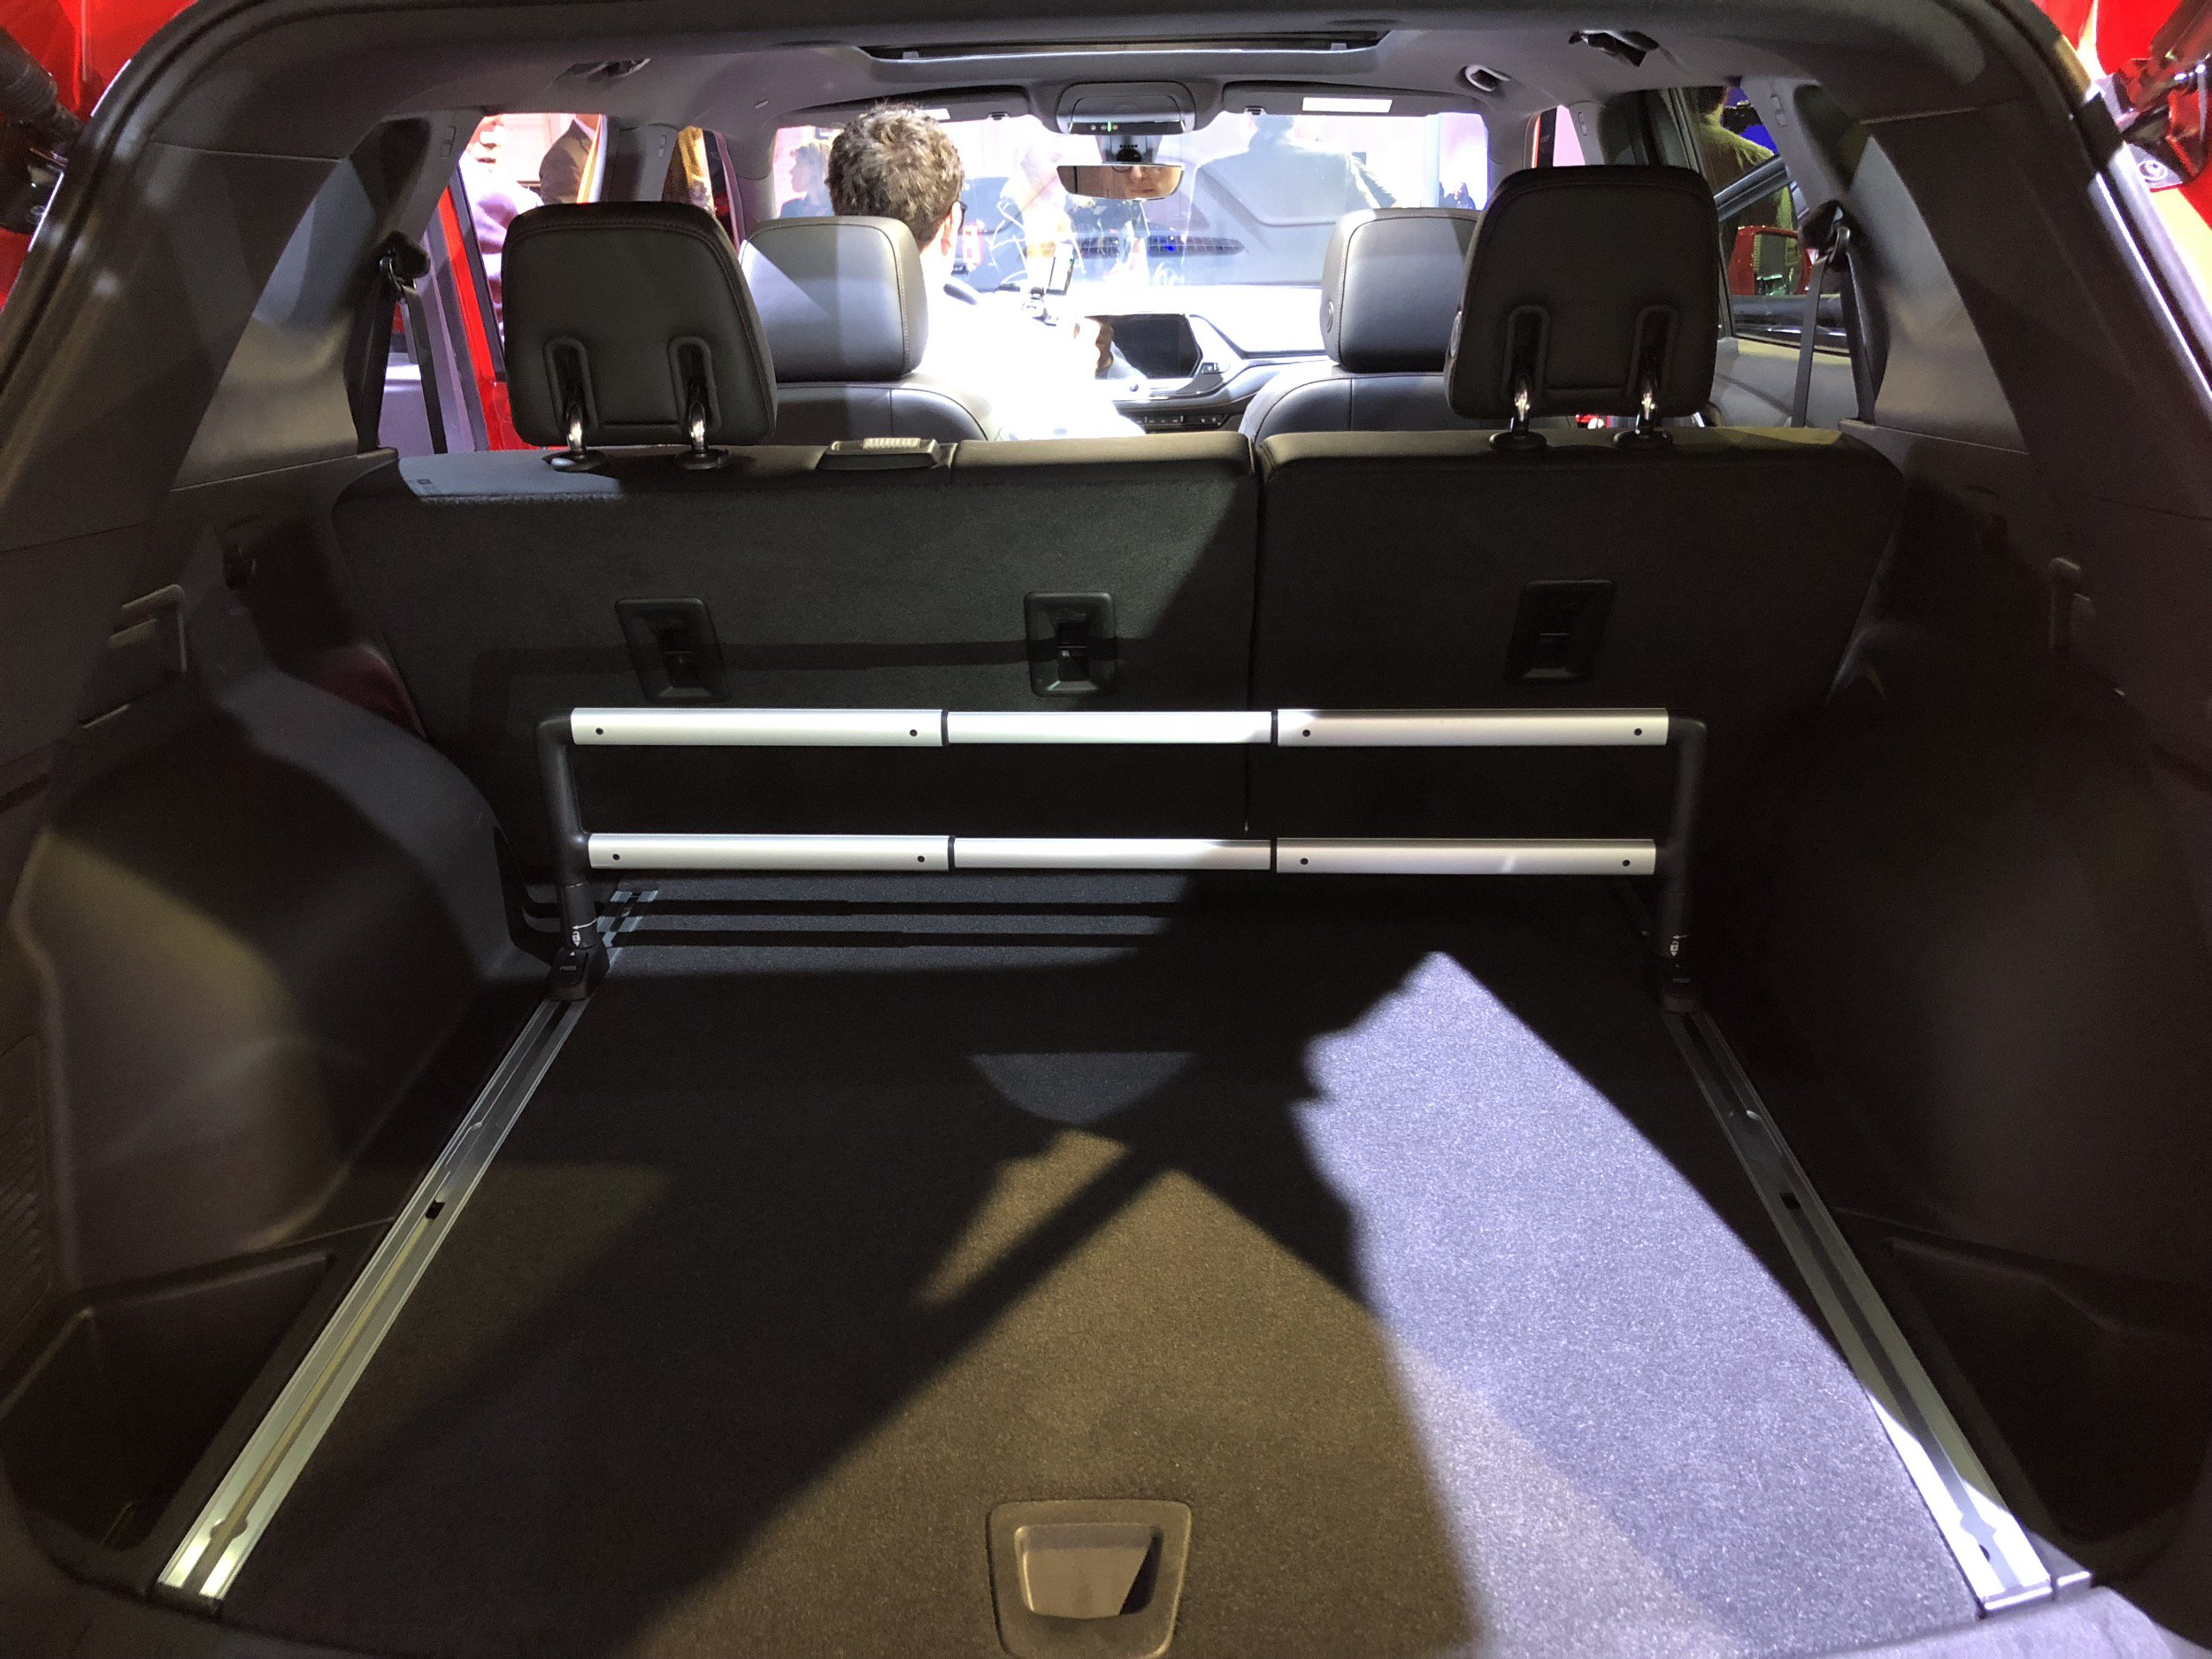 2019 Chevrolet Blazer Reboot Of A Cult Classic Brings Mixed